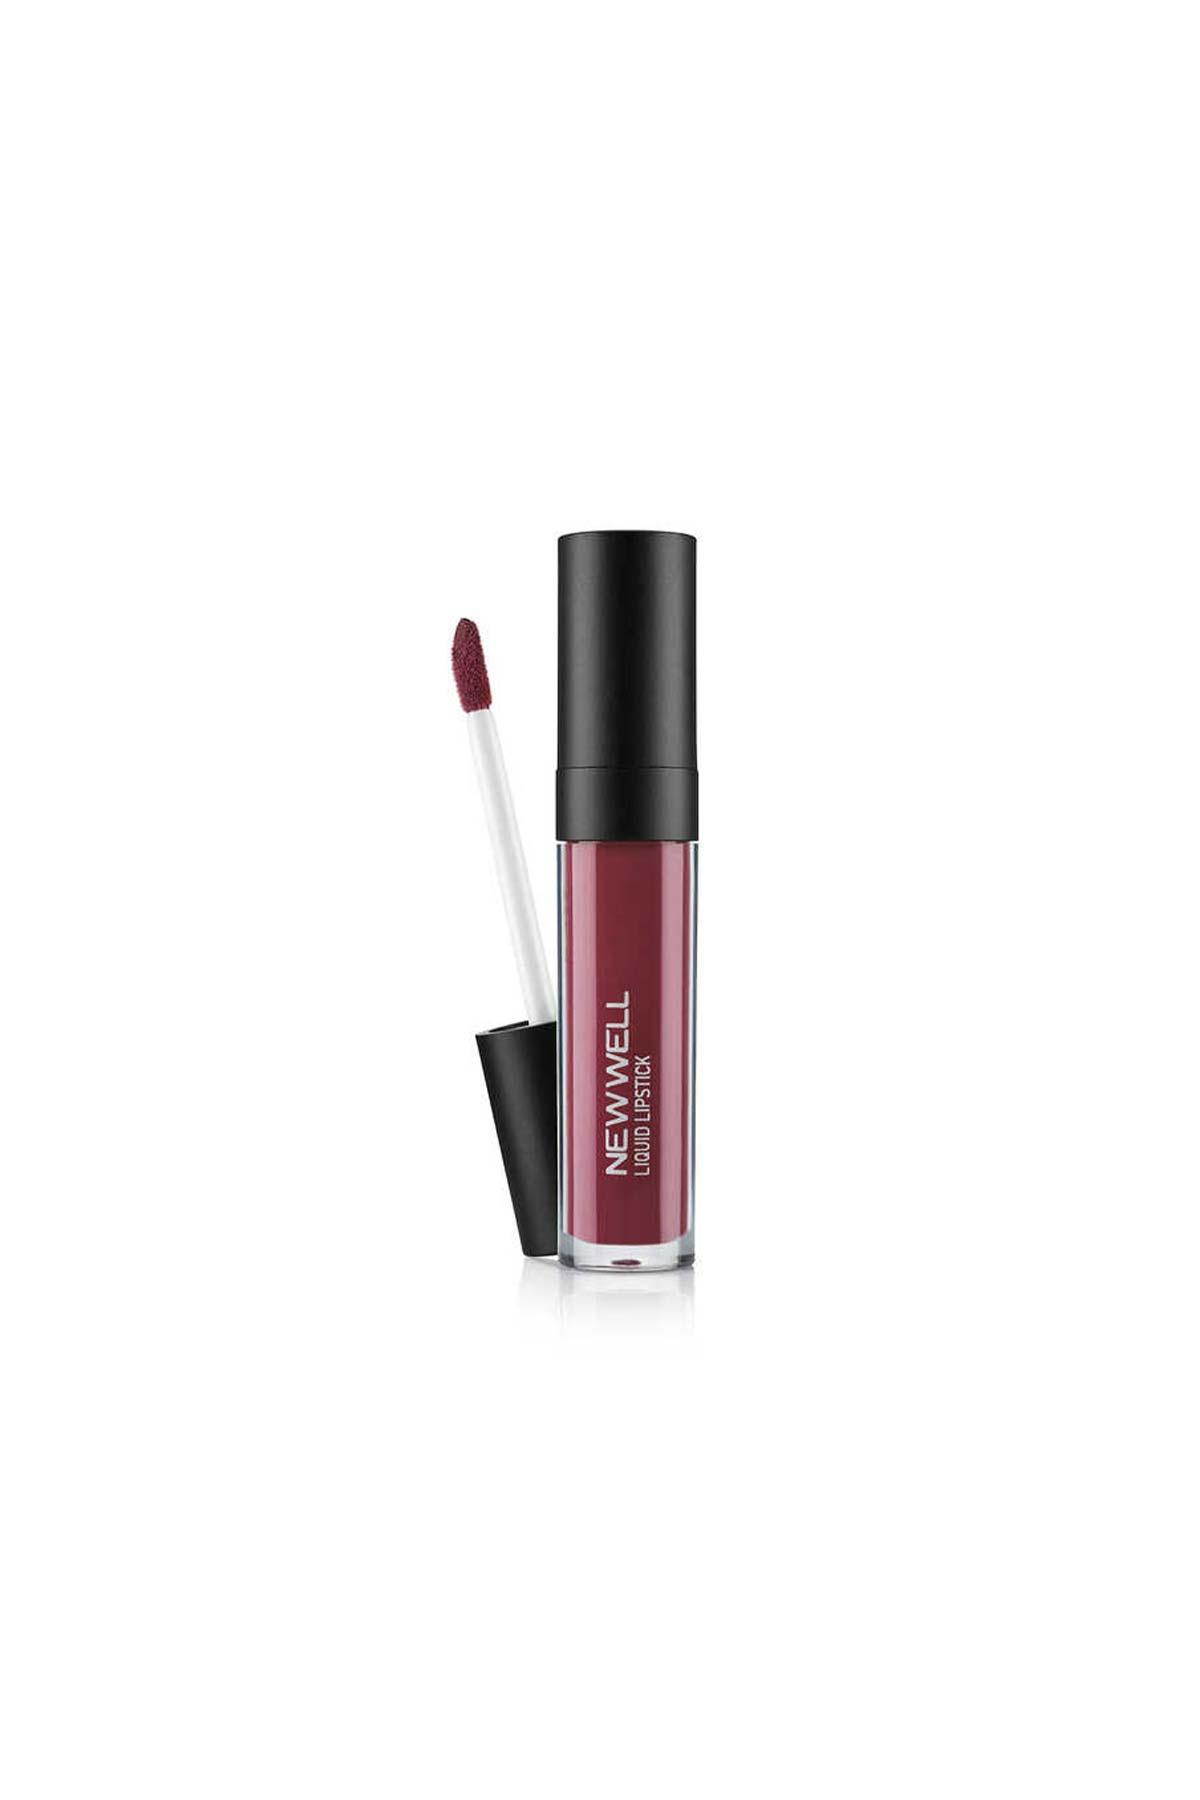 Liquid Lipgloss - 207 -Ruj - Lipstick Thumbnail